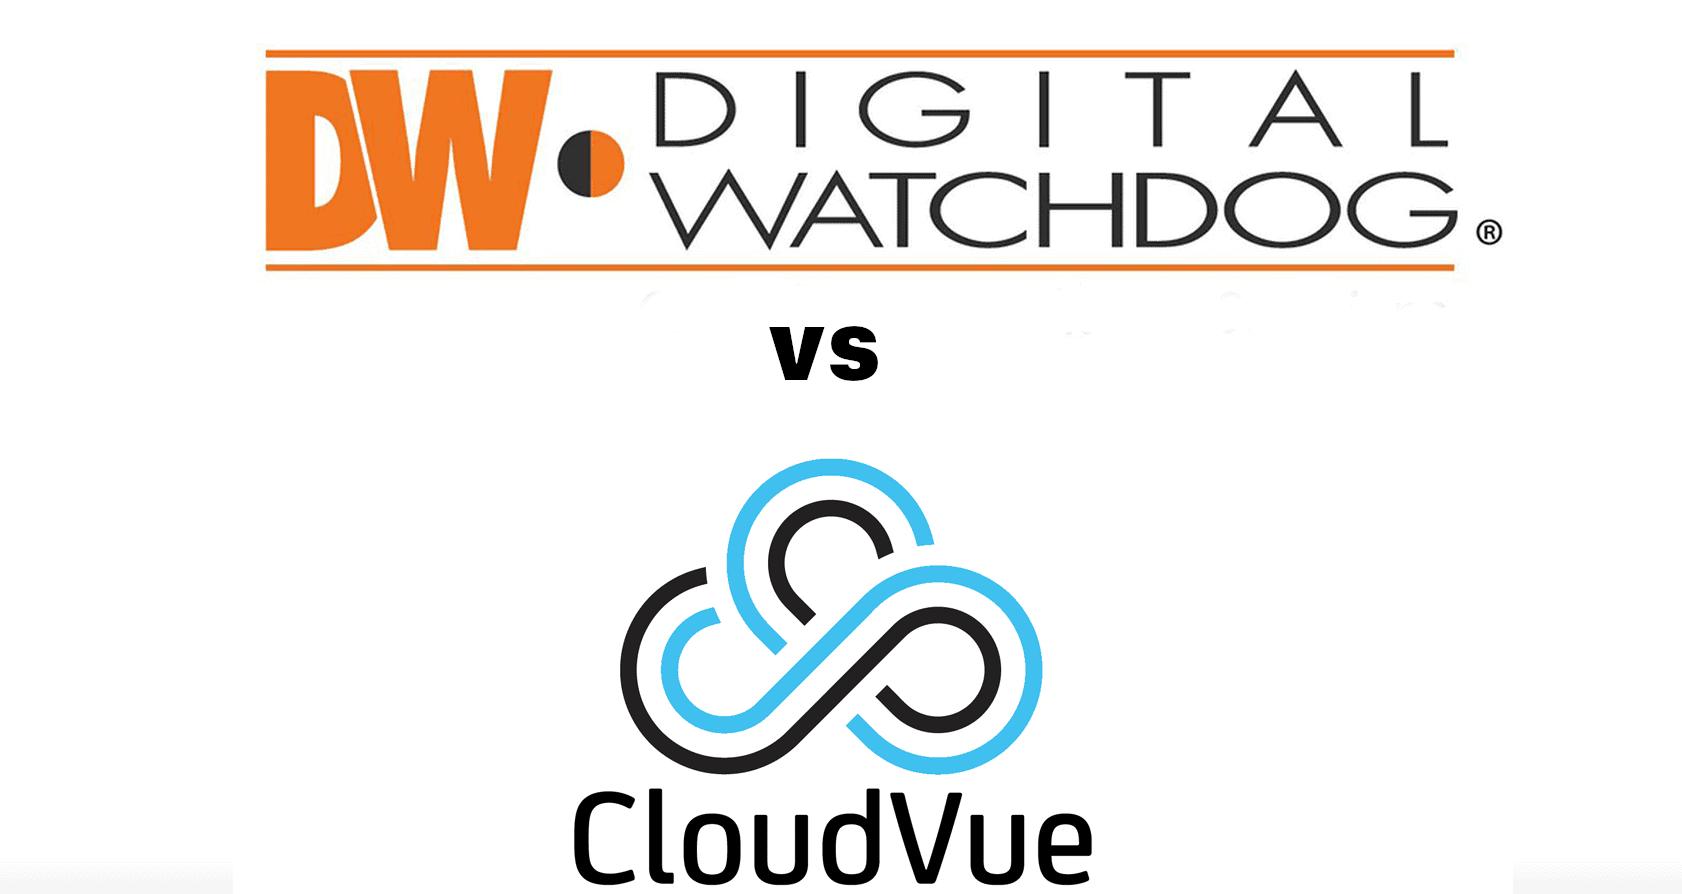 Digital Watchdog vs cloudvue